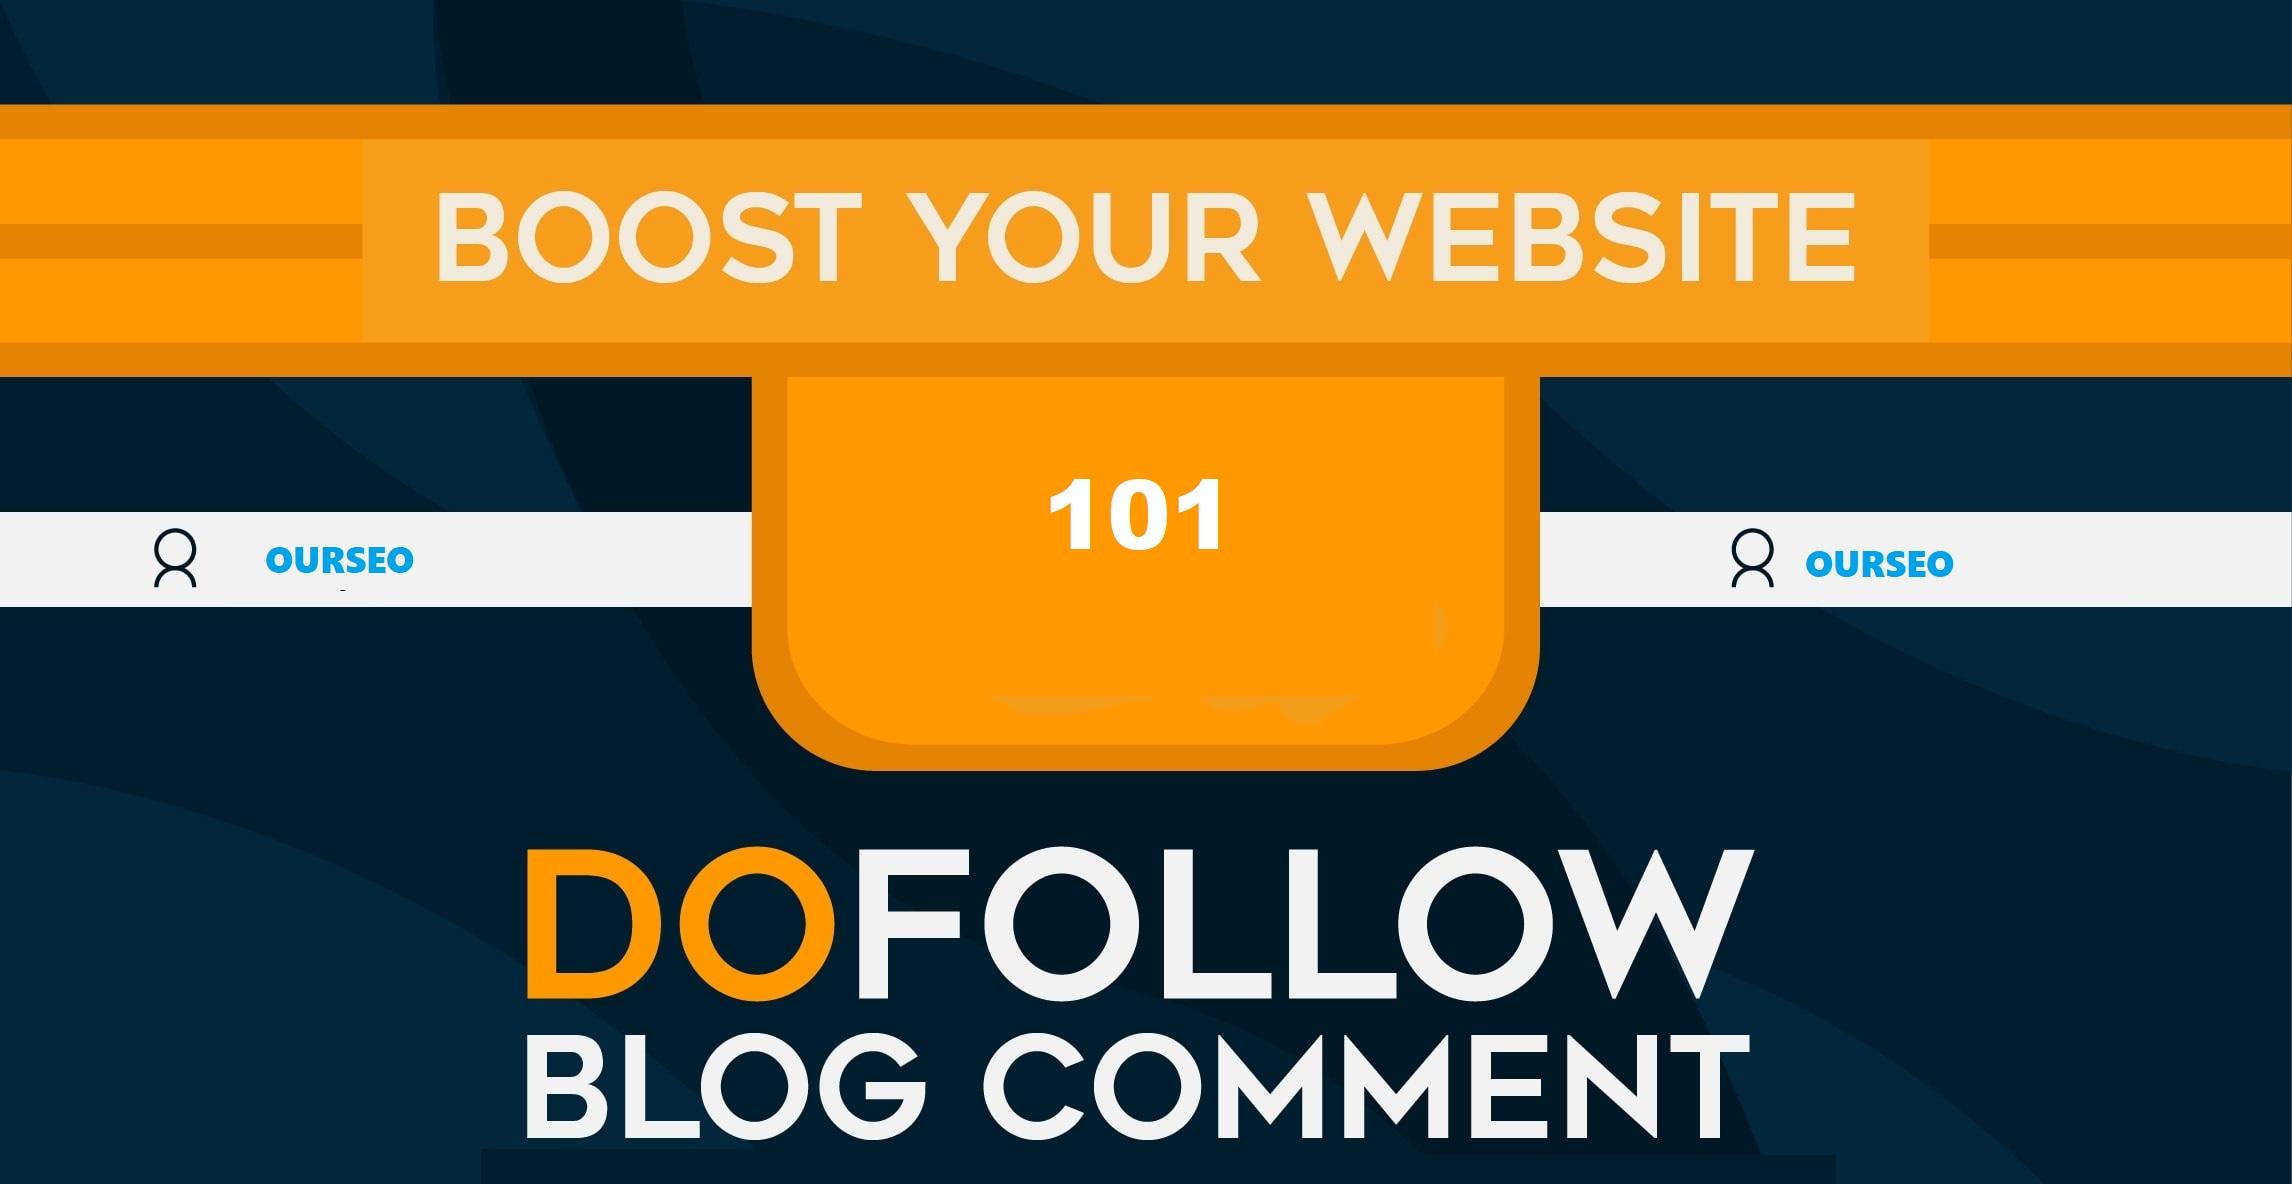 101 Dofollow BLOG COMMENTS Backlinks